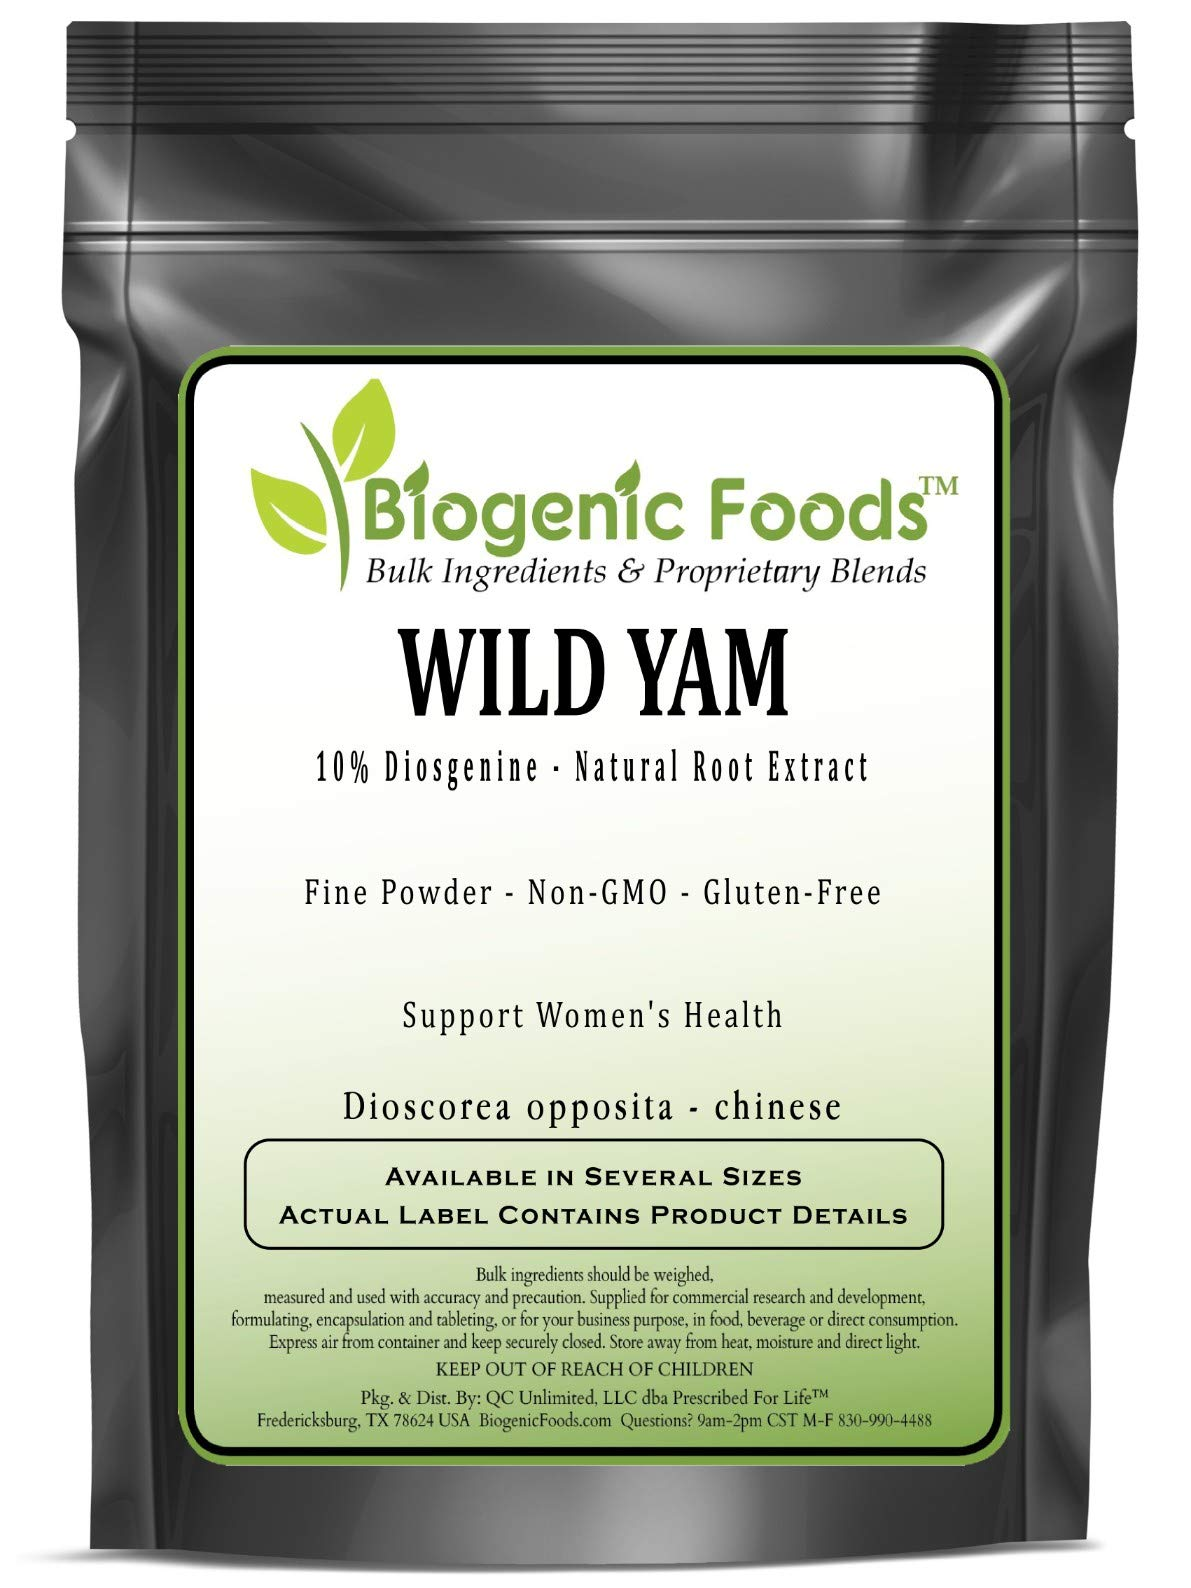 Wild Yam - 10% Diosgenine - Natural Root Fine Powder Extract (Dioscorea opposita - Chinese), 10 kg